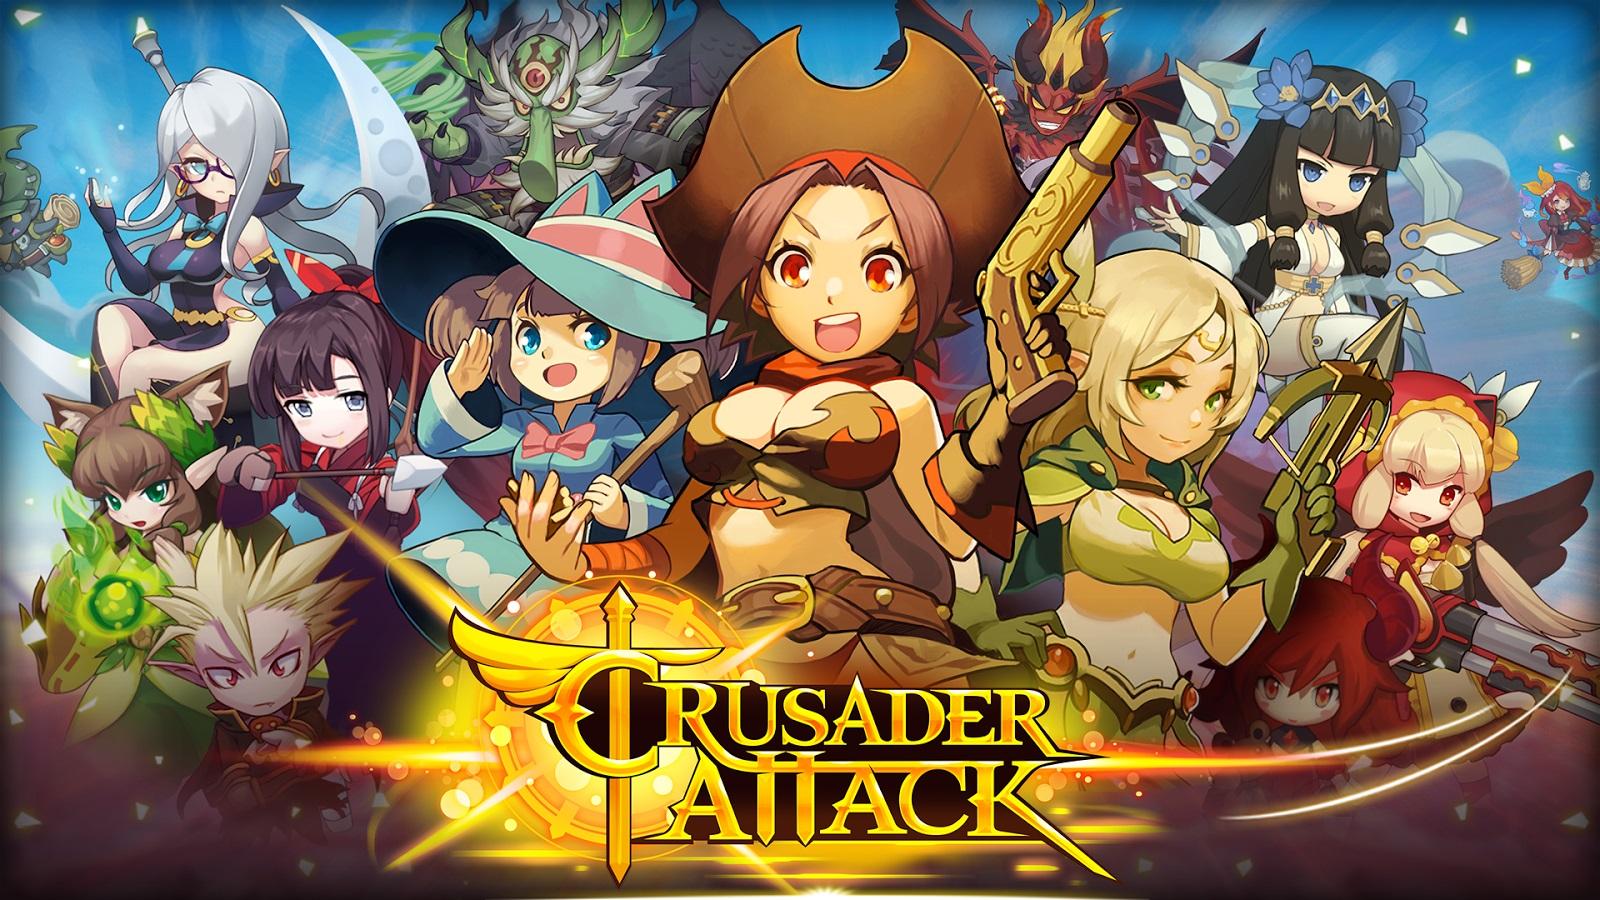 Crusader Attack